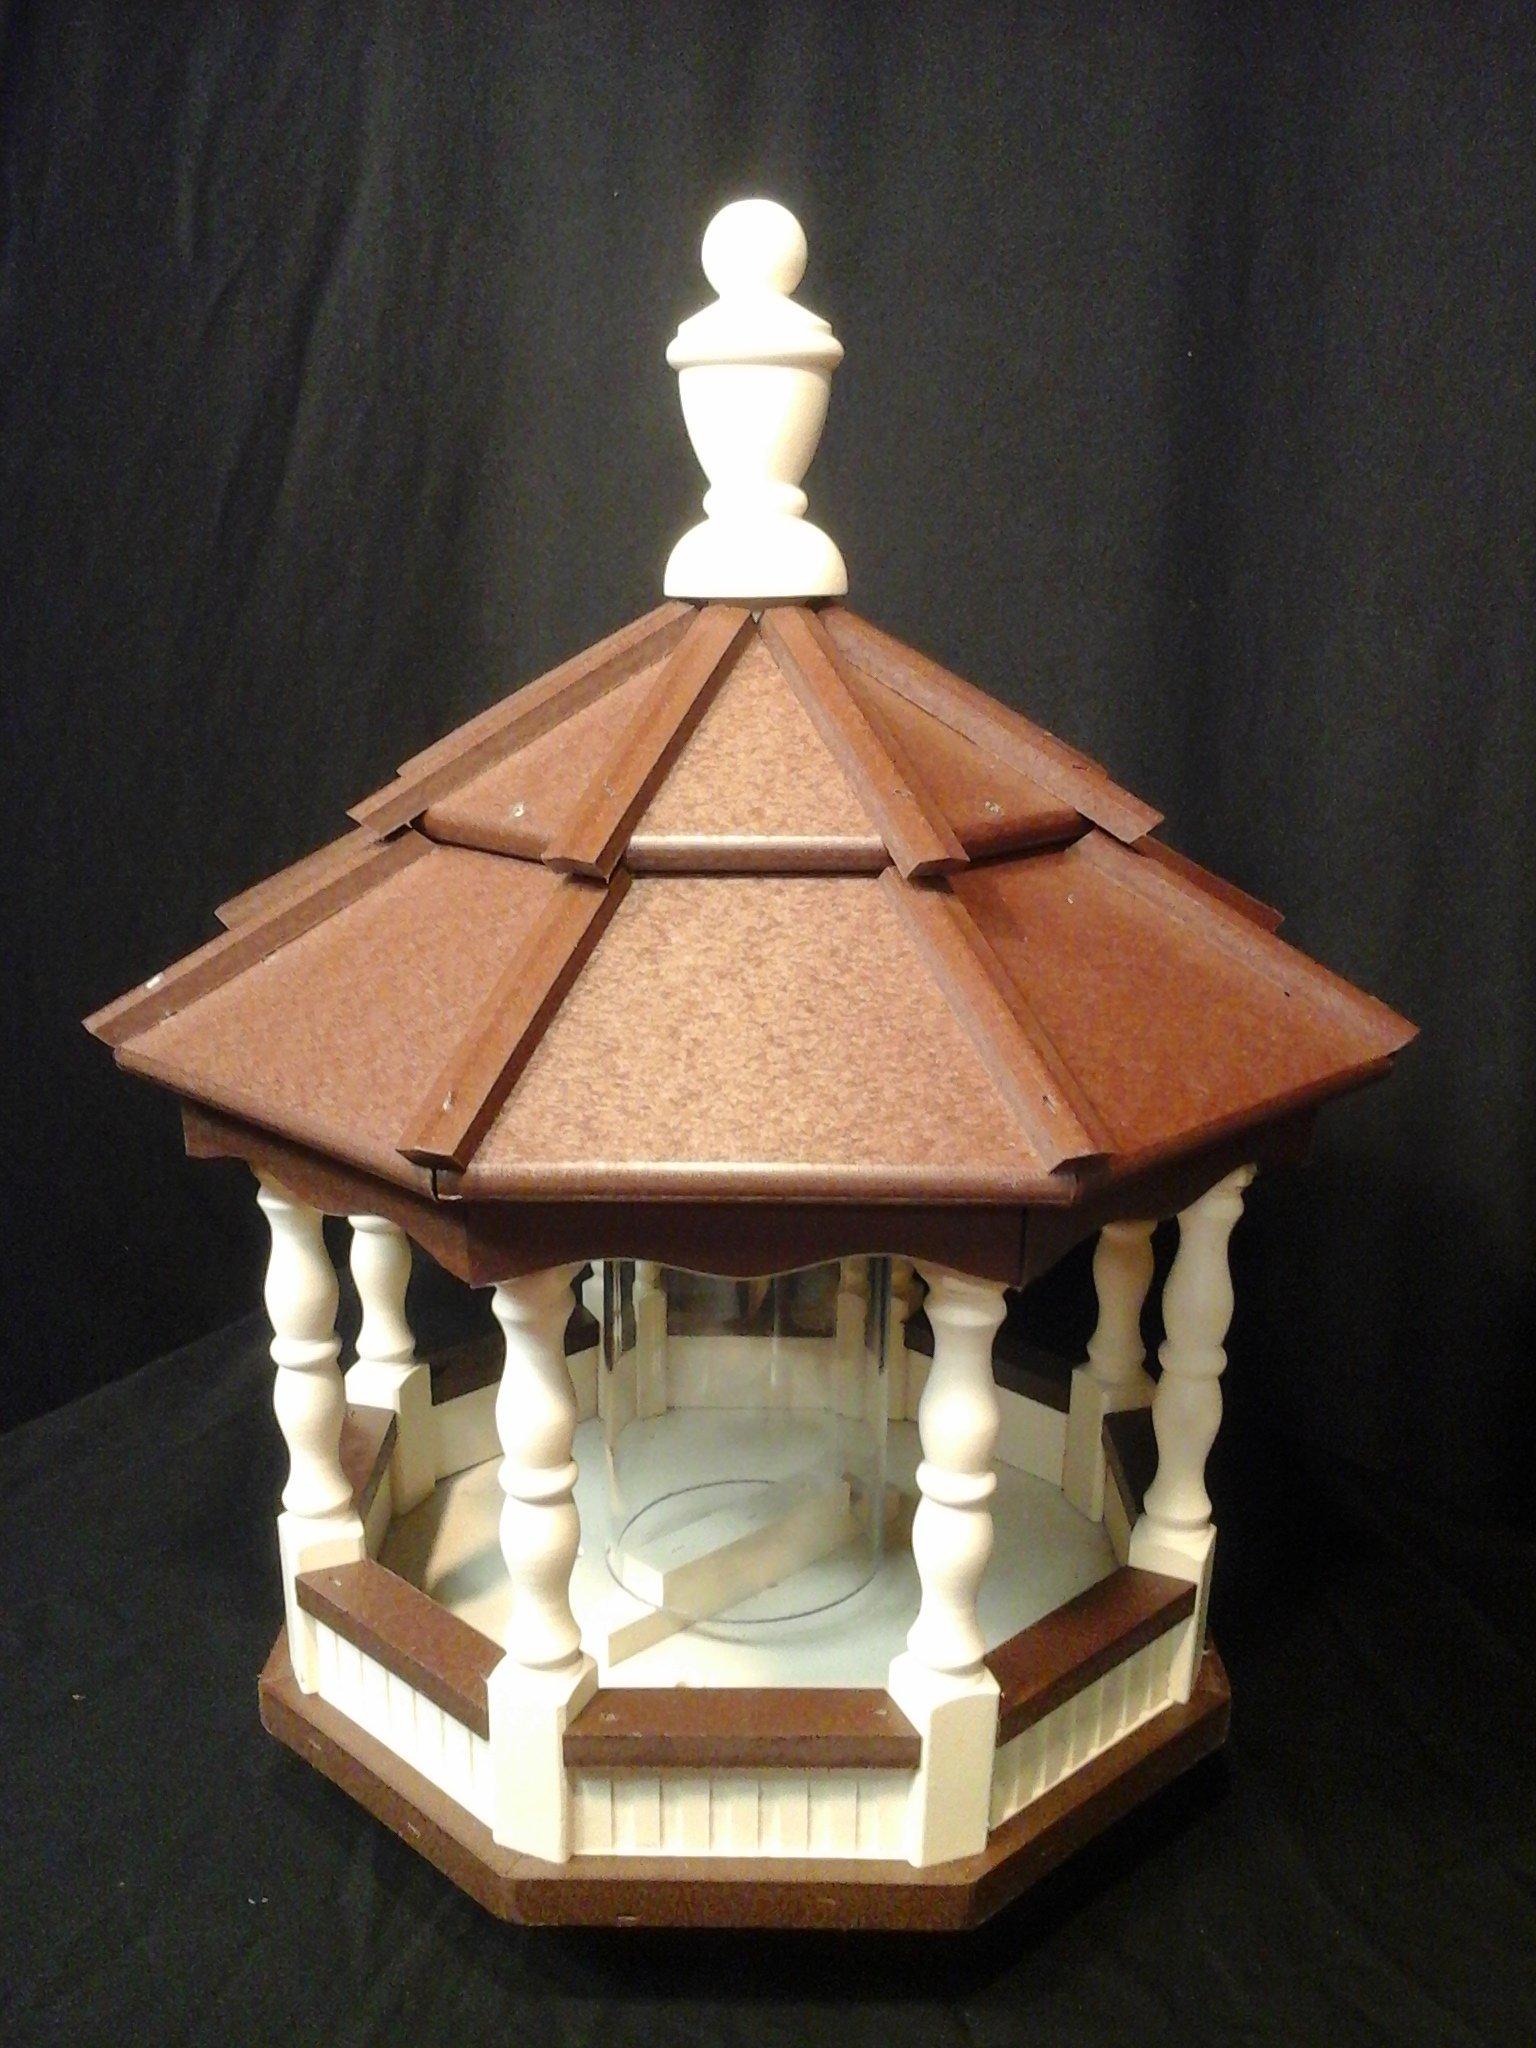 Medium Vinyl Bird Feeder Amish Spindle Homemade Handmade Handcrafted Ivory & Brown